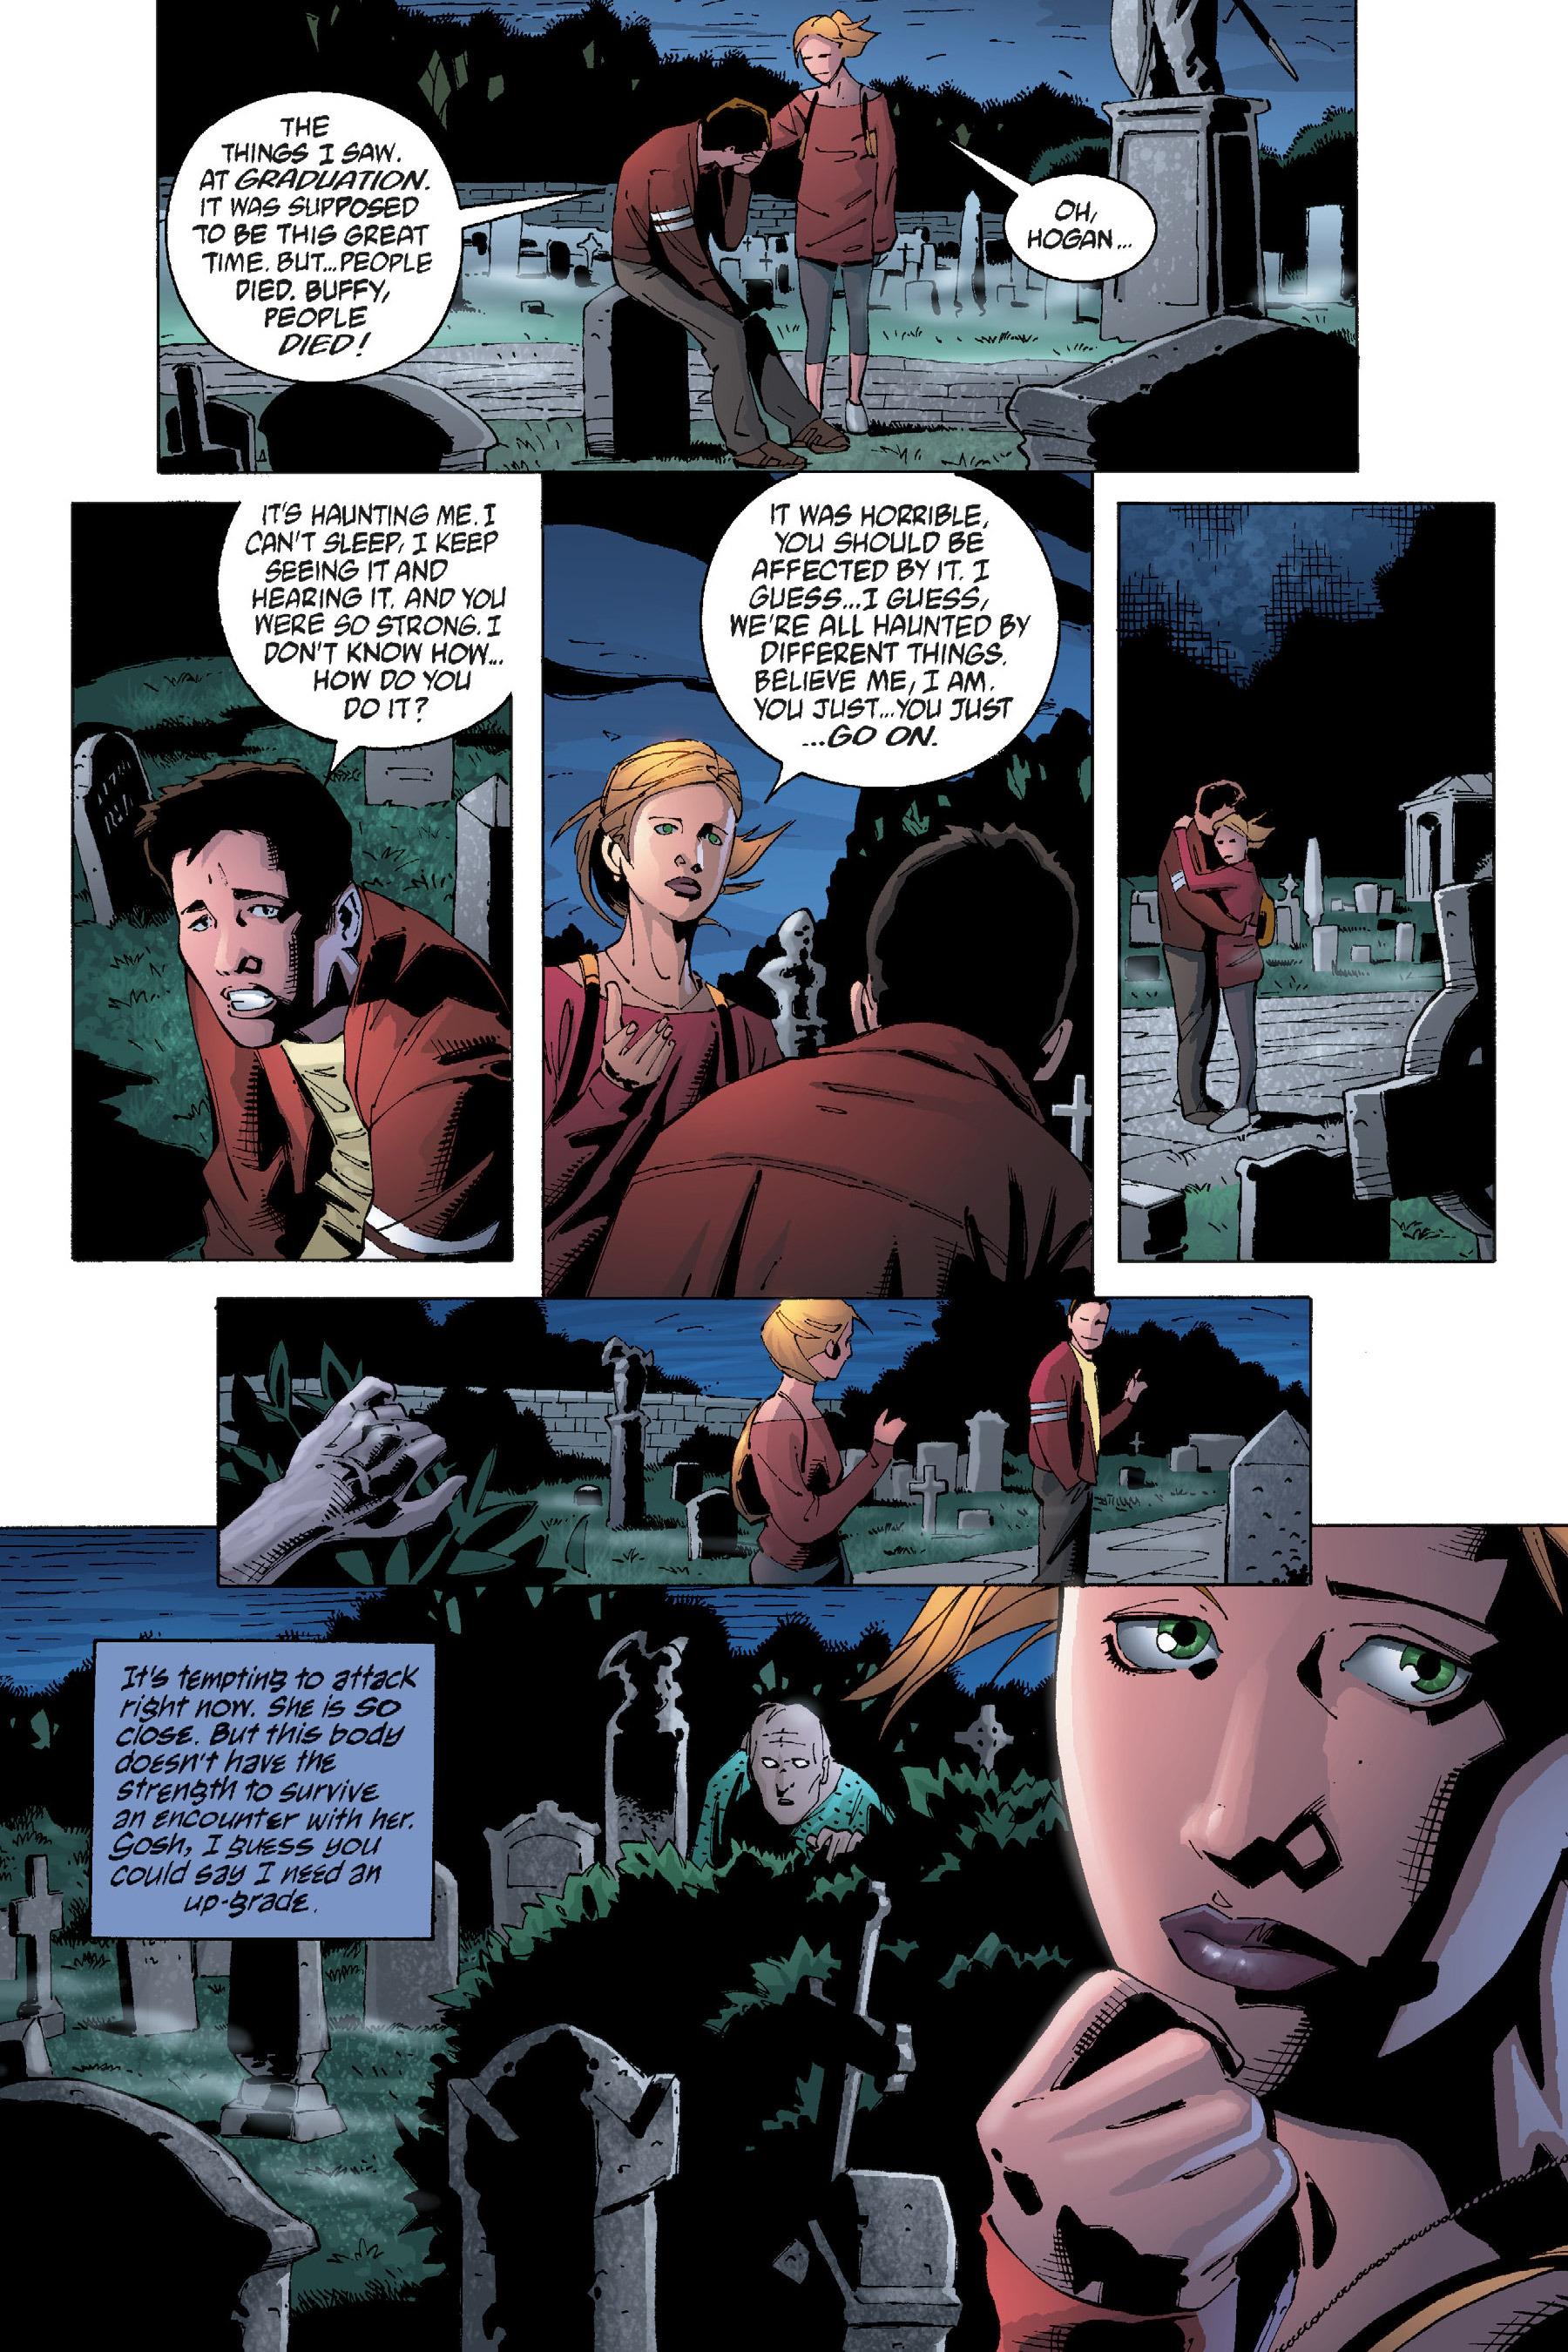 Read online Buffy the Vampire Slayer: Omnibus comic -  Issue # TPB 5 - 27